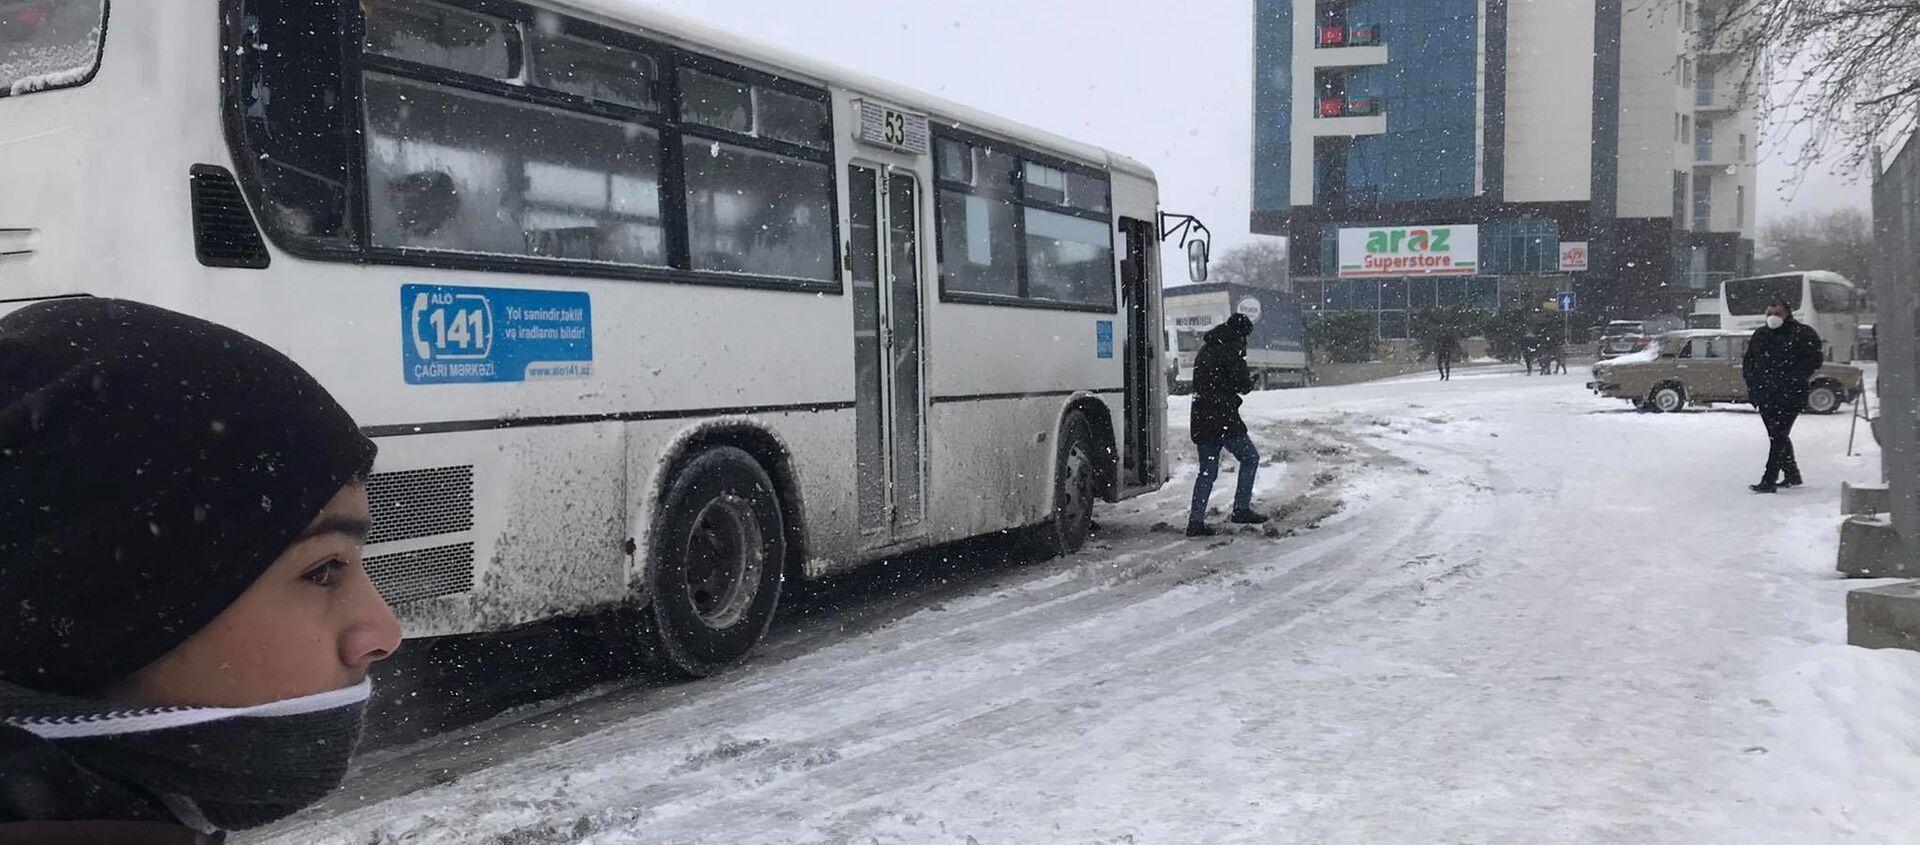 Ситуация в Баку после снегопада, 24 февраля 2021 года - Sputnik Азербайджан, 1920, 24.02.2021